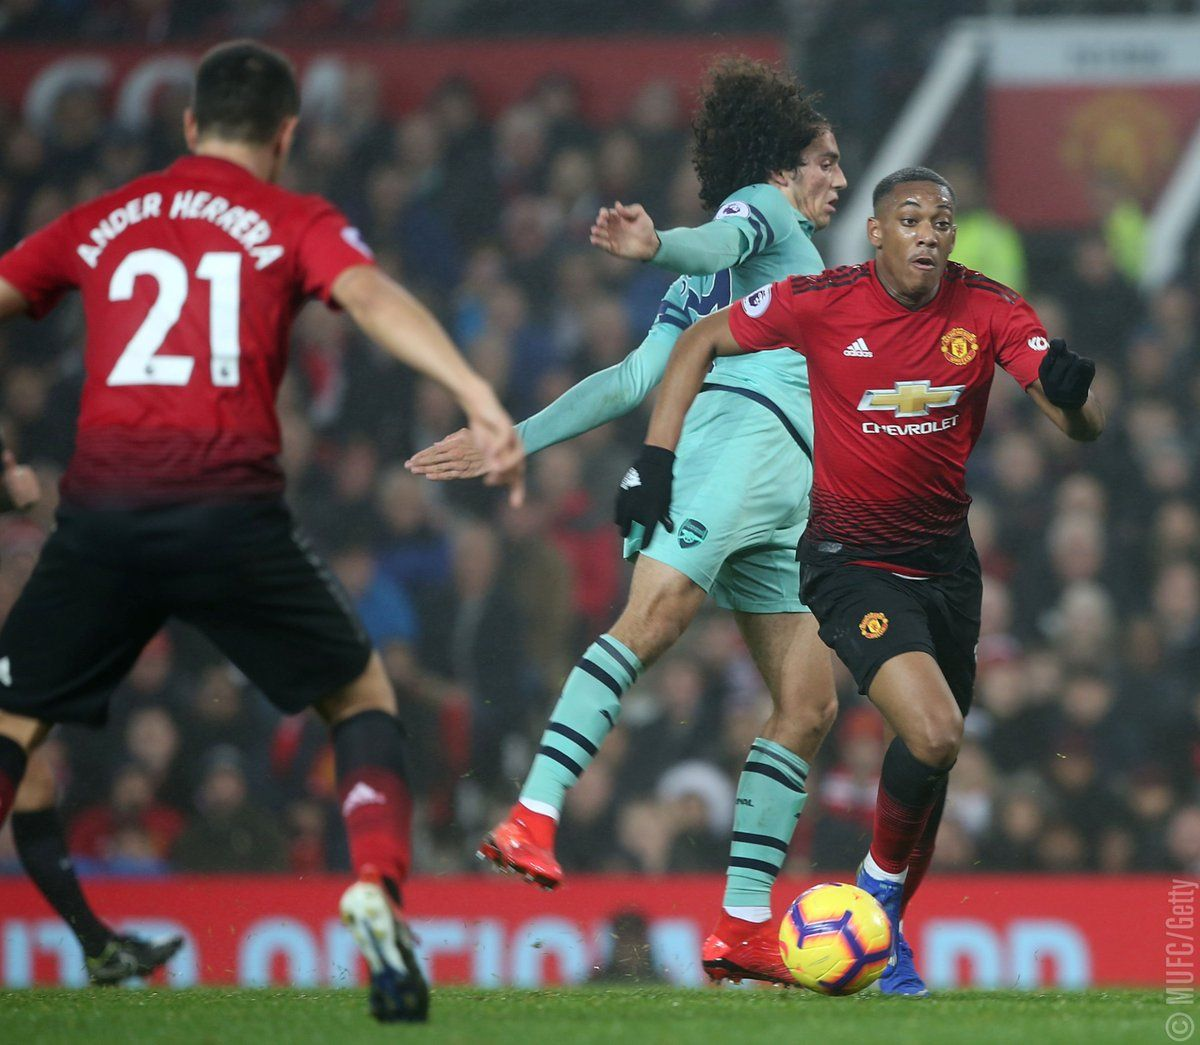 Man United 2 - 2 Arsenal